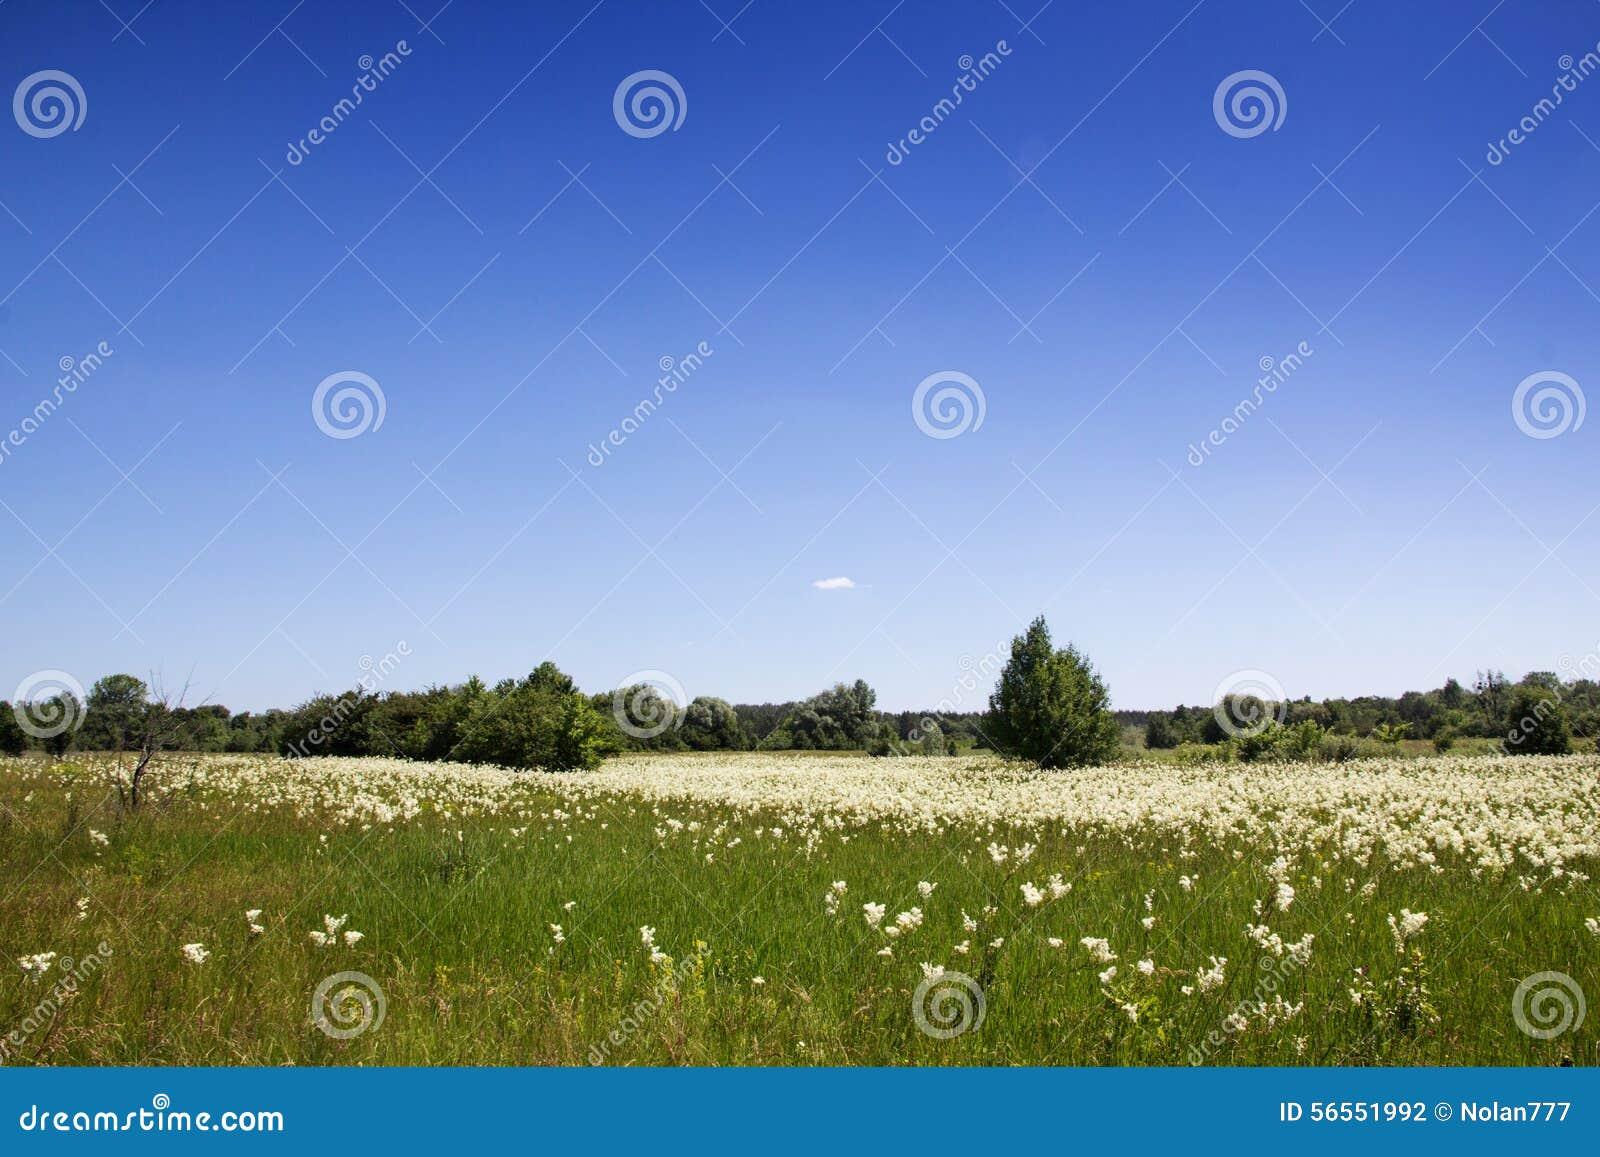 Download Μπλε λουλούδια προς το λιβάδι Στοκ Εικόνες - εικόνα από μακροεντολή, ημέρα: 56551992